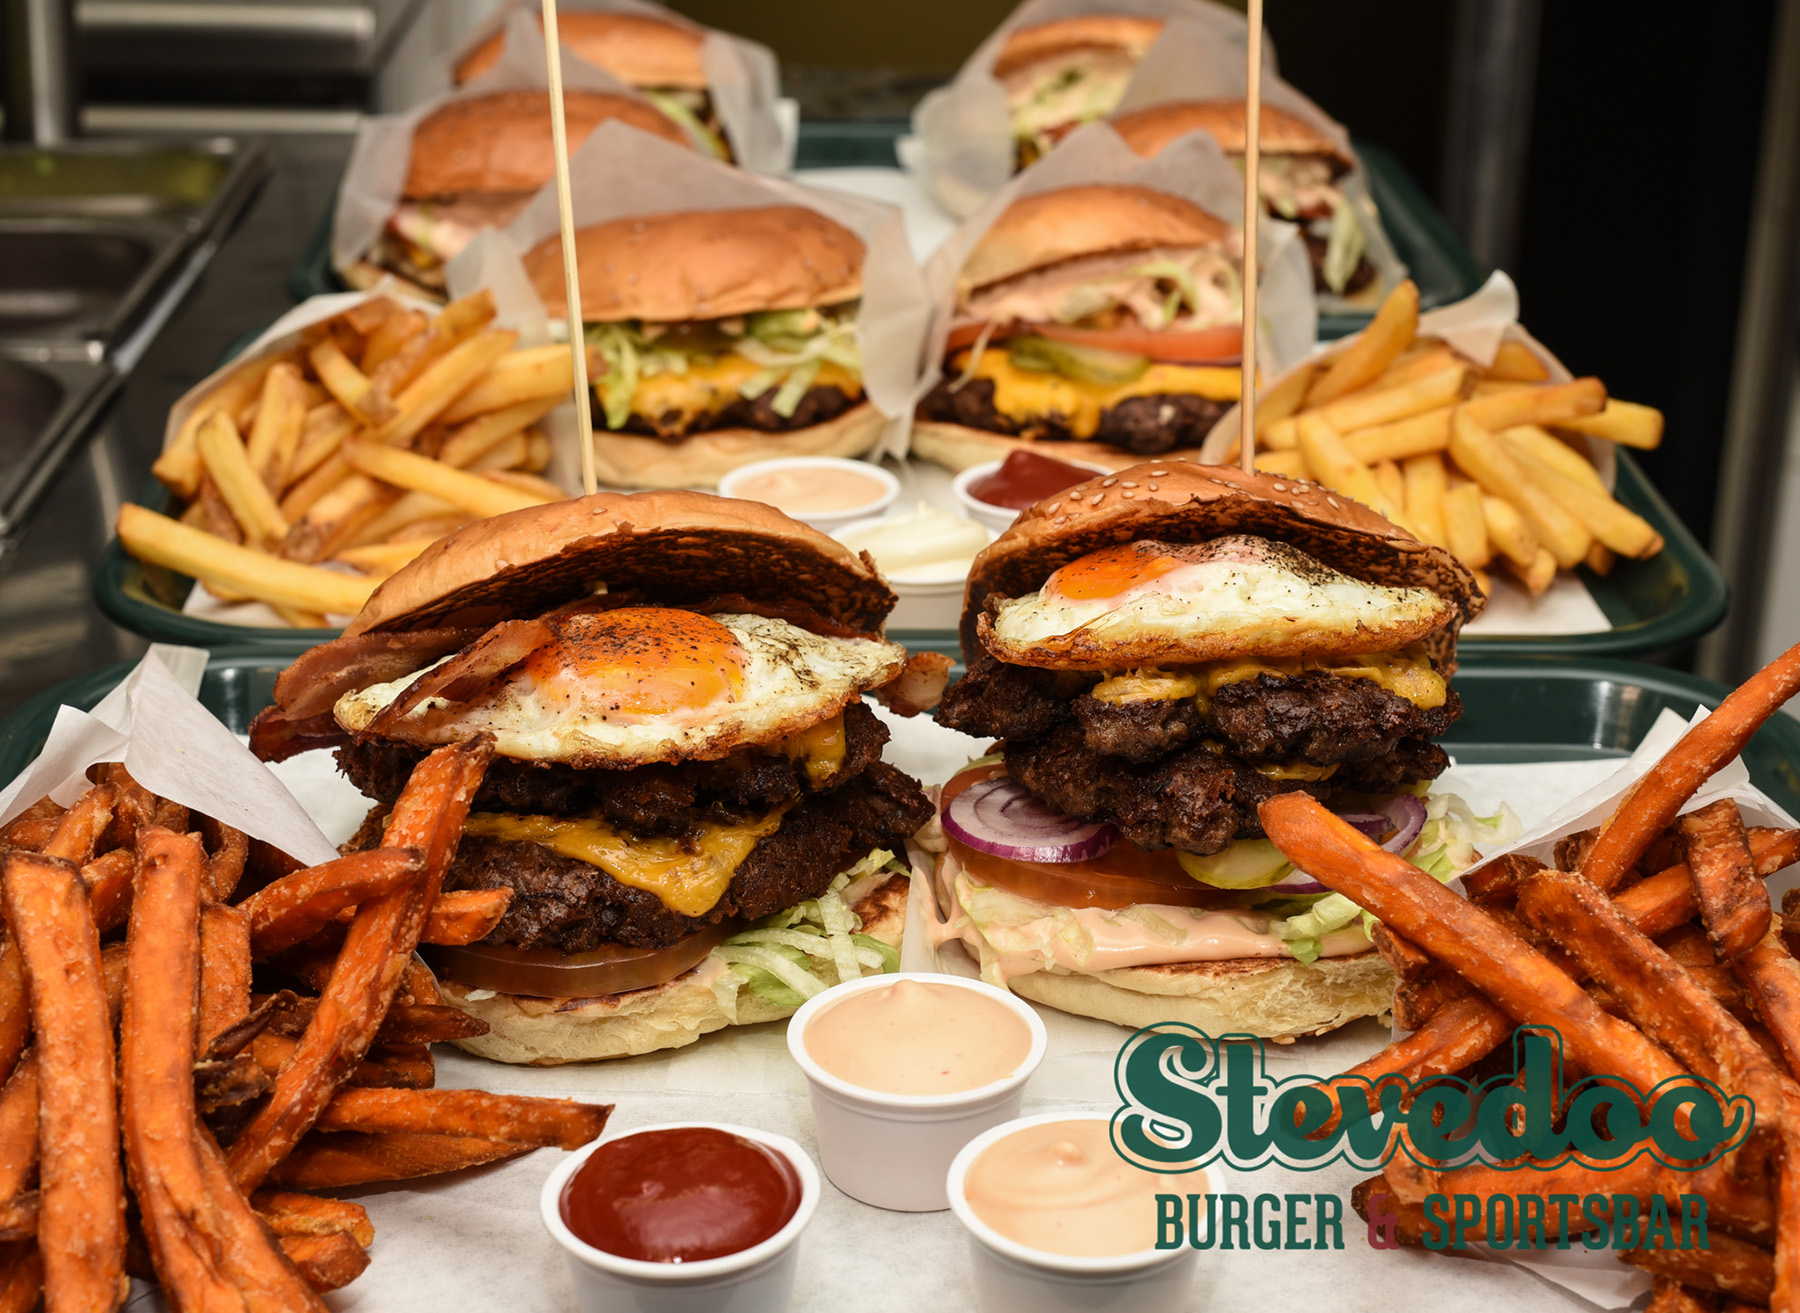 Stevedoo_Burger_Sportbar_Frankfurt_FastFood_61